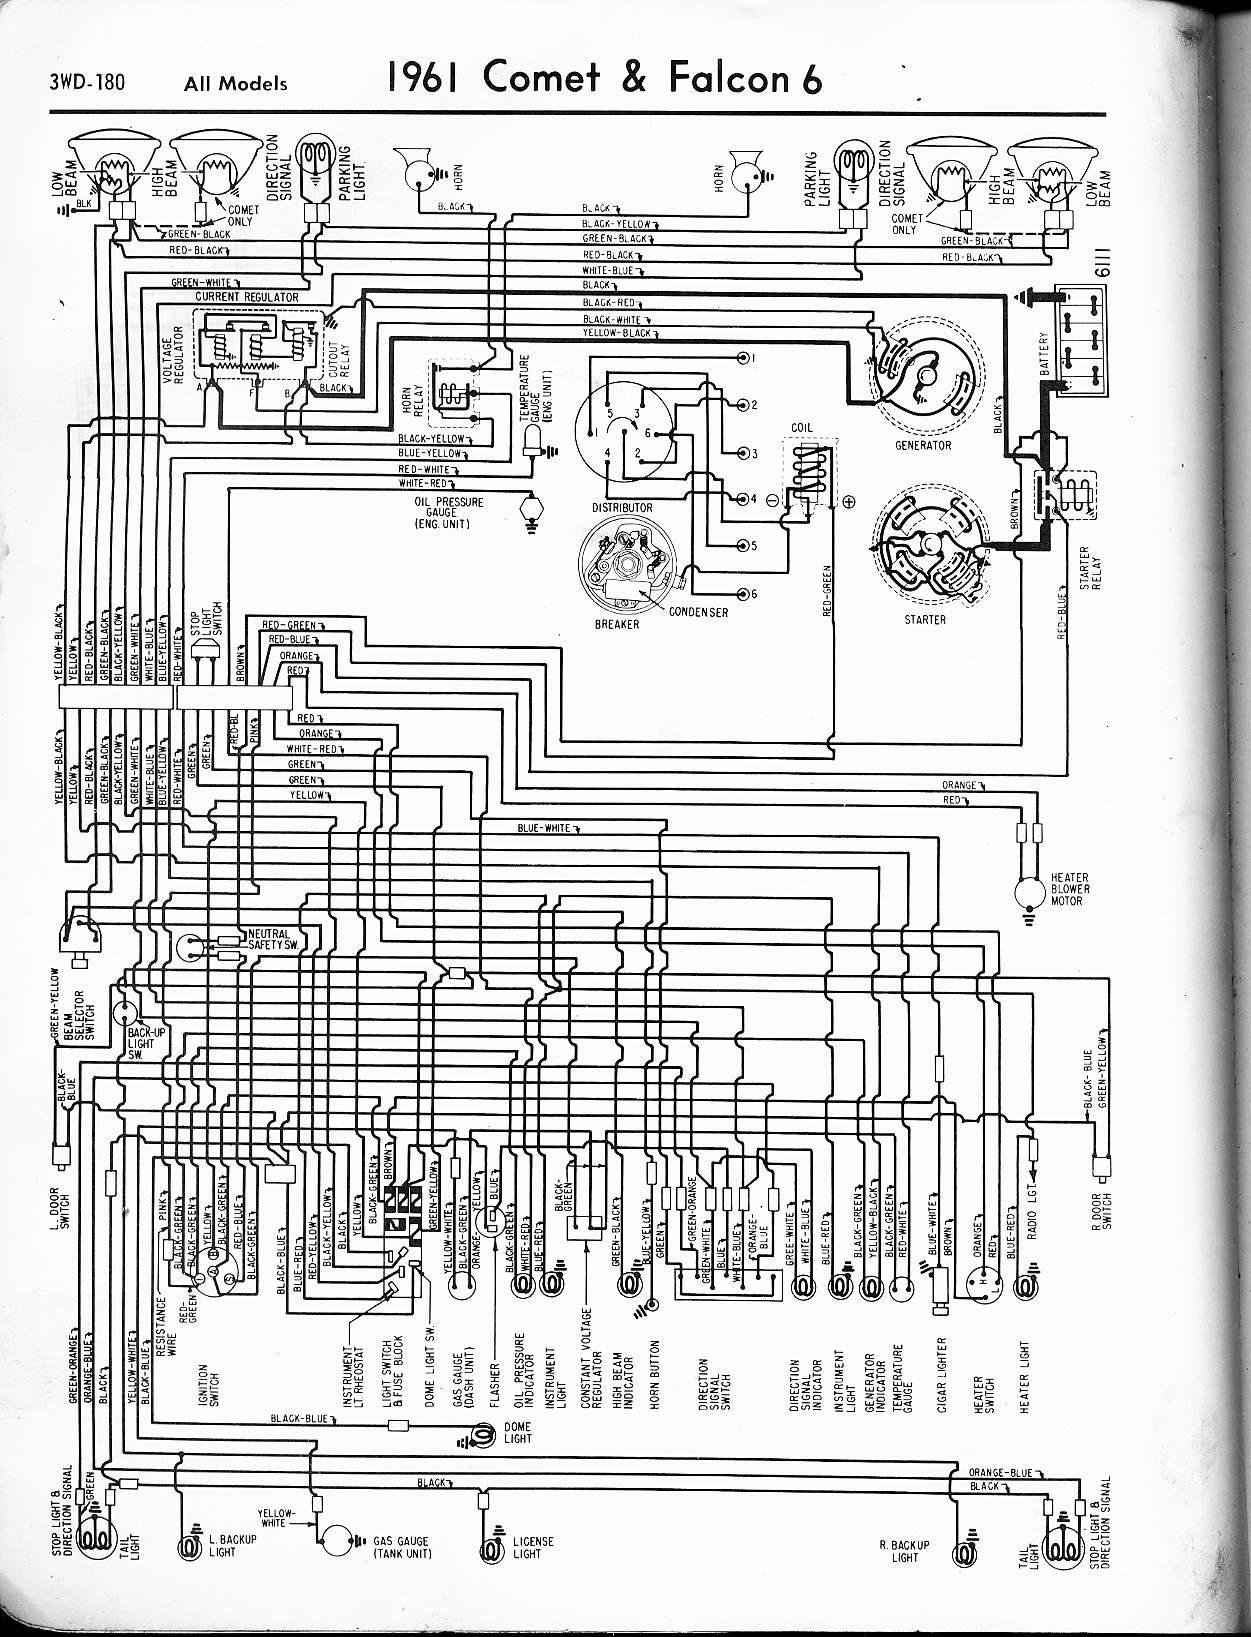 1977 ford f100 wiring diagram 1977 ford f100 wiring diagram 1968 ford f100 wiring diagram stereo #10